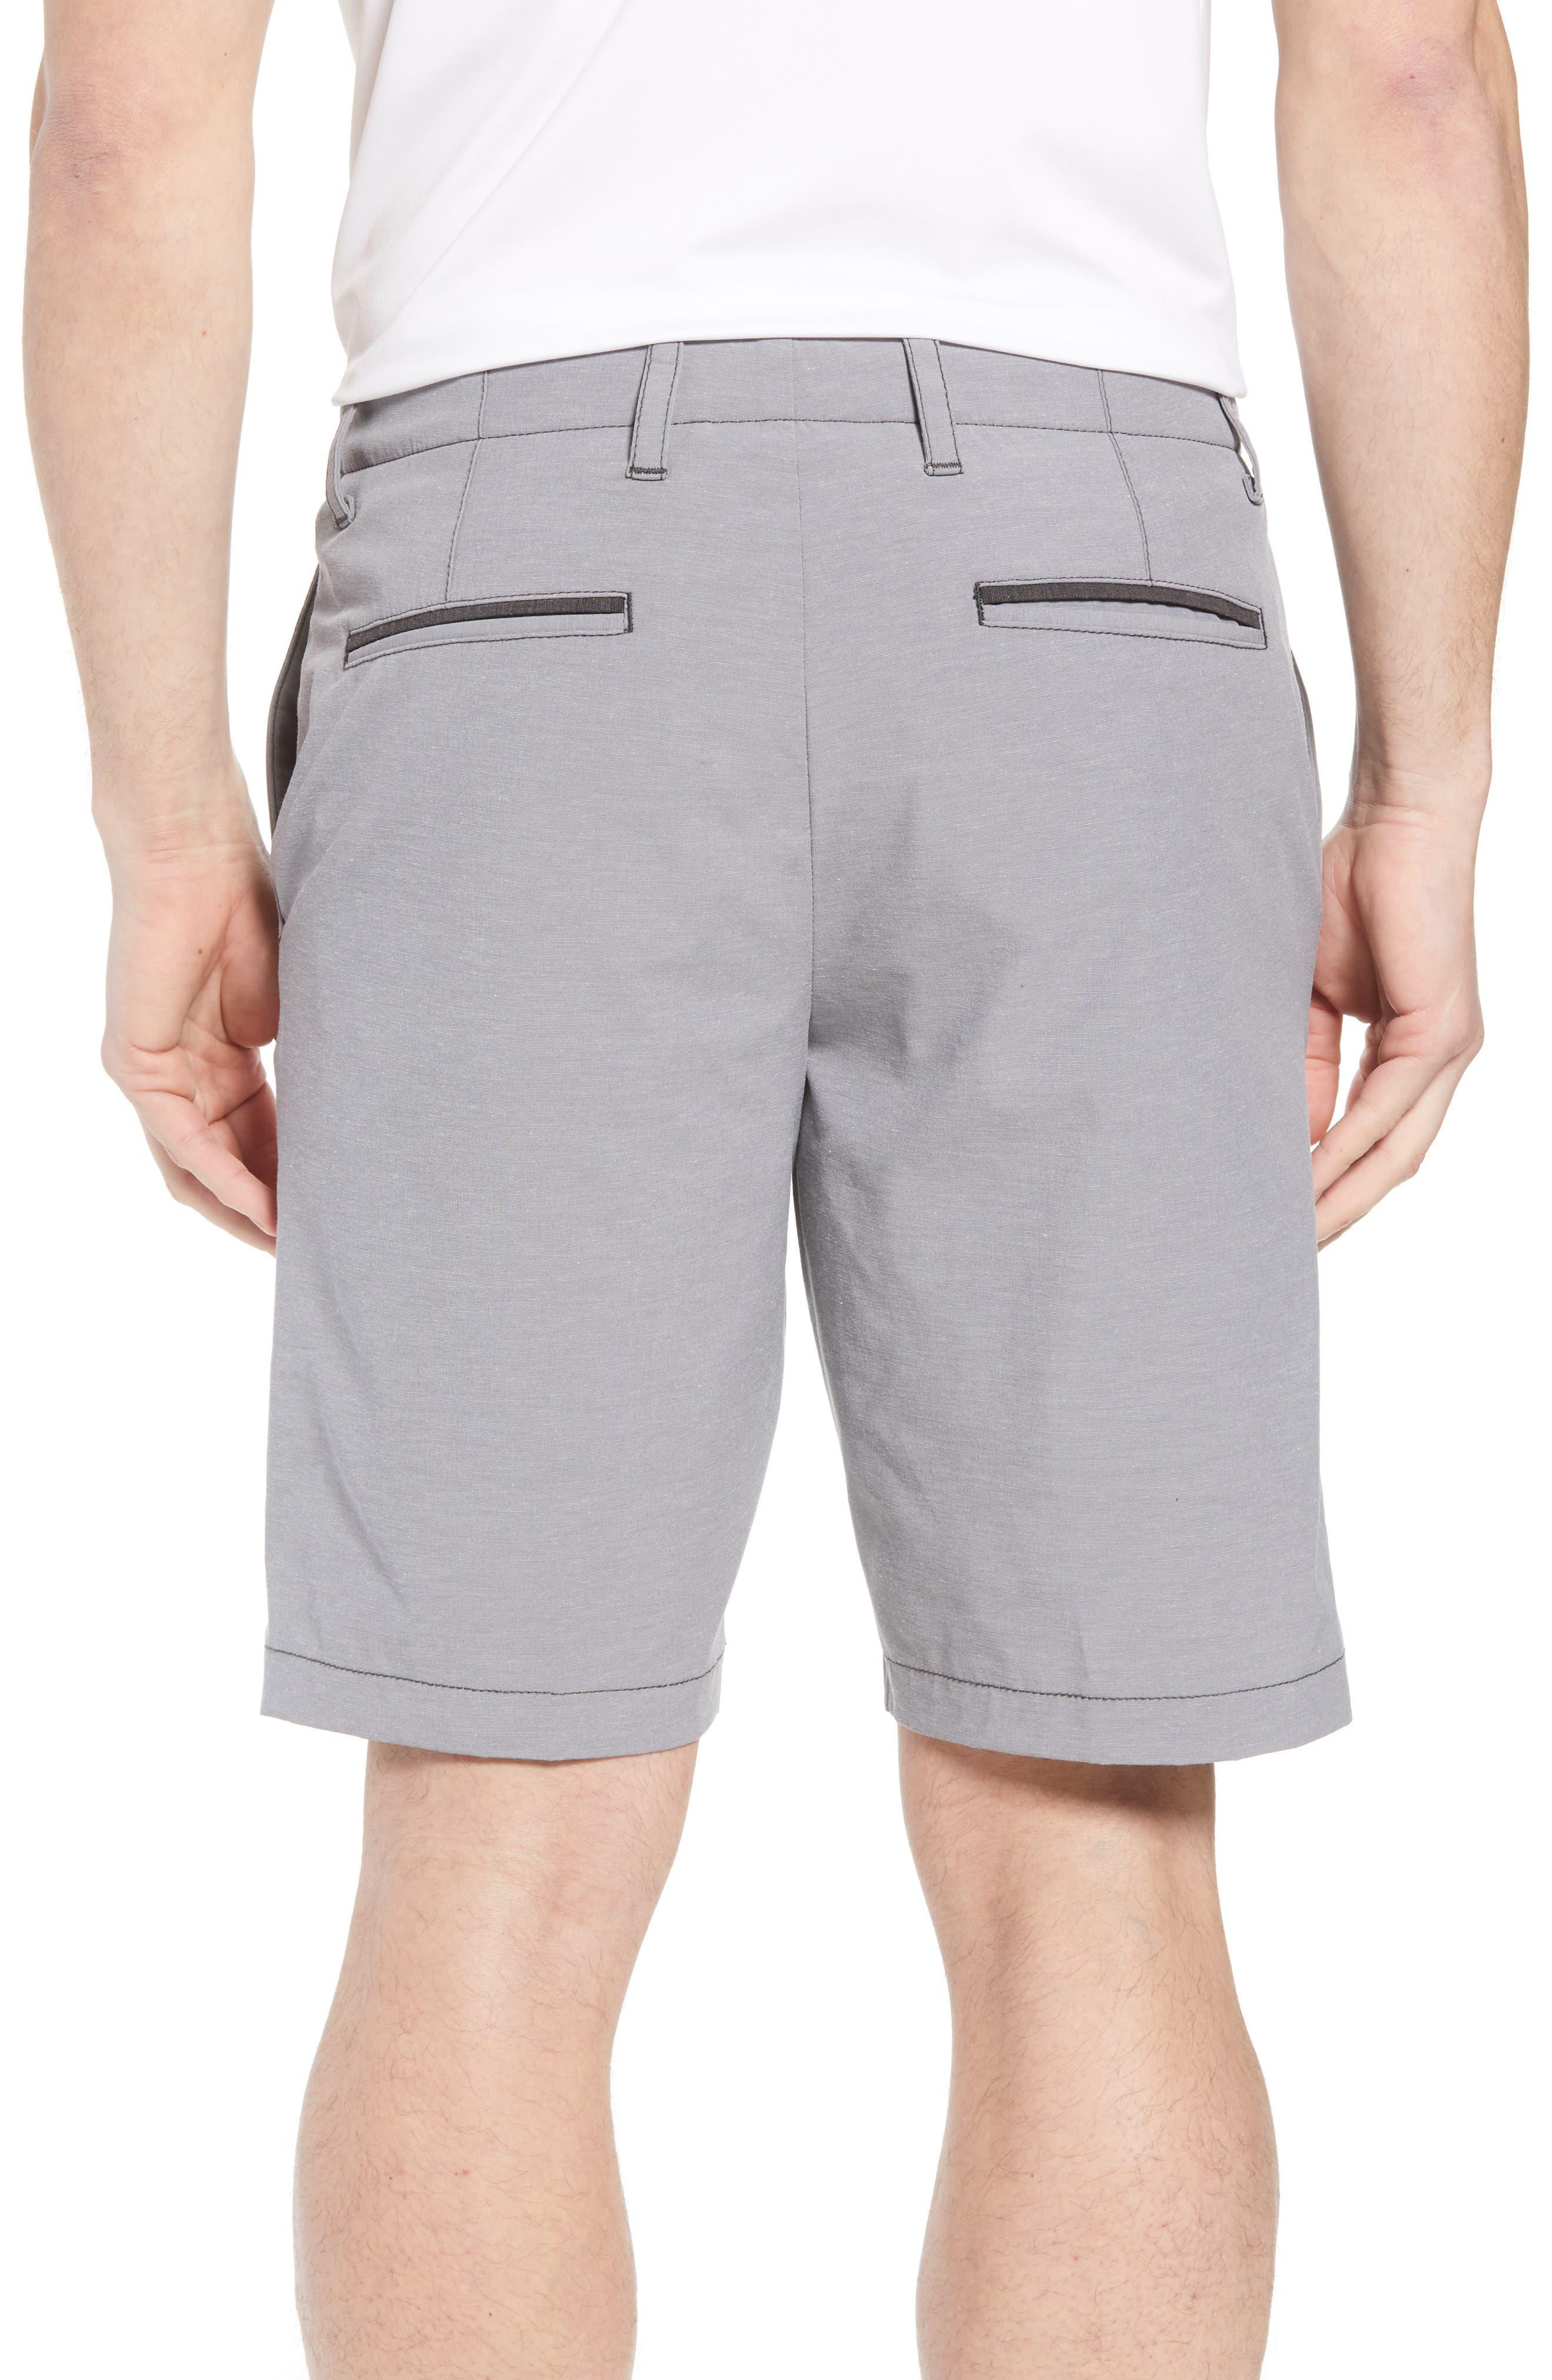 Chip & Run Shorts,                             Alternate thumbnail 2, color,                             Storm Gray